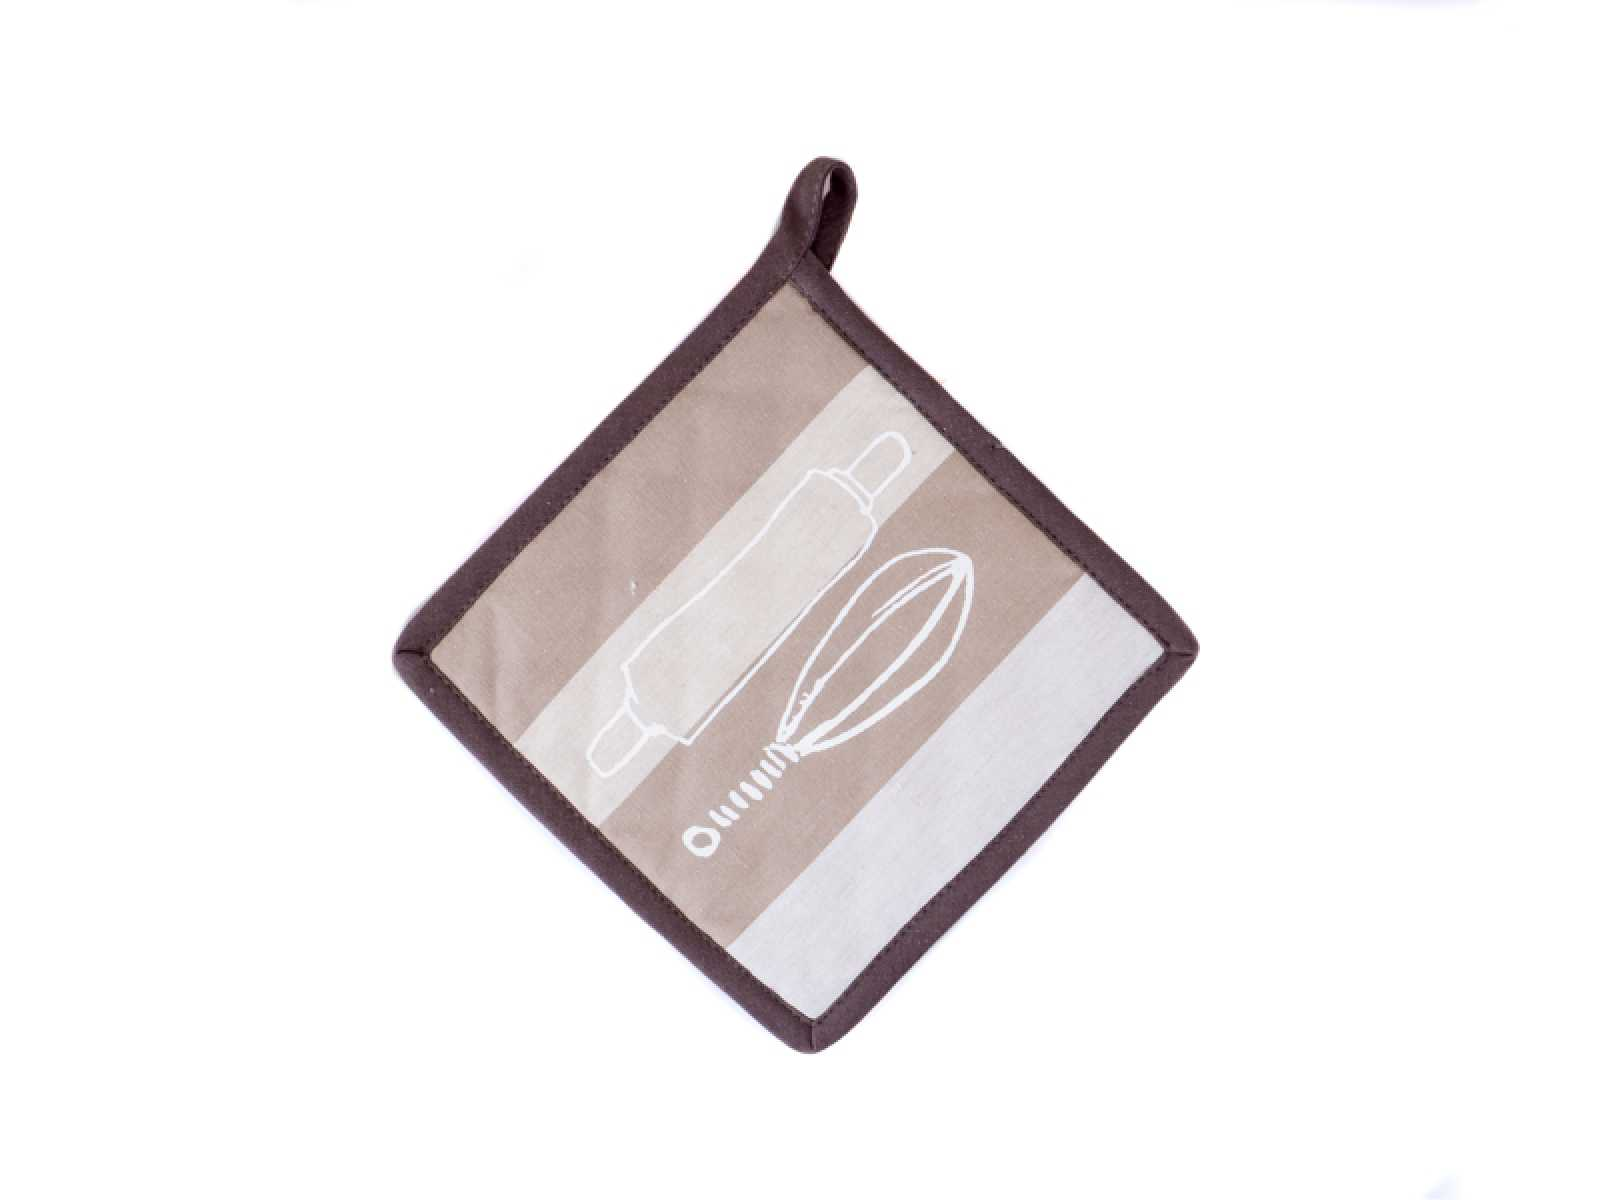 Онлайн каталог PROMENU: Прихватка кухонная Winkler FANTASY NATURAL, 20х20 см, бежевый в полоску Winkler 4626780000